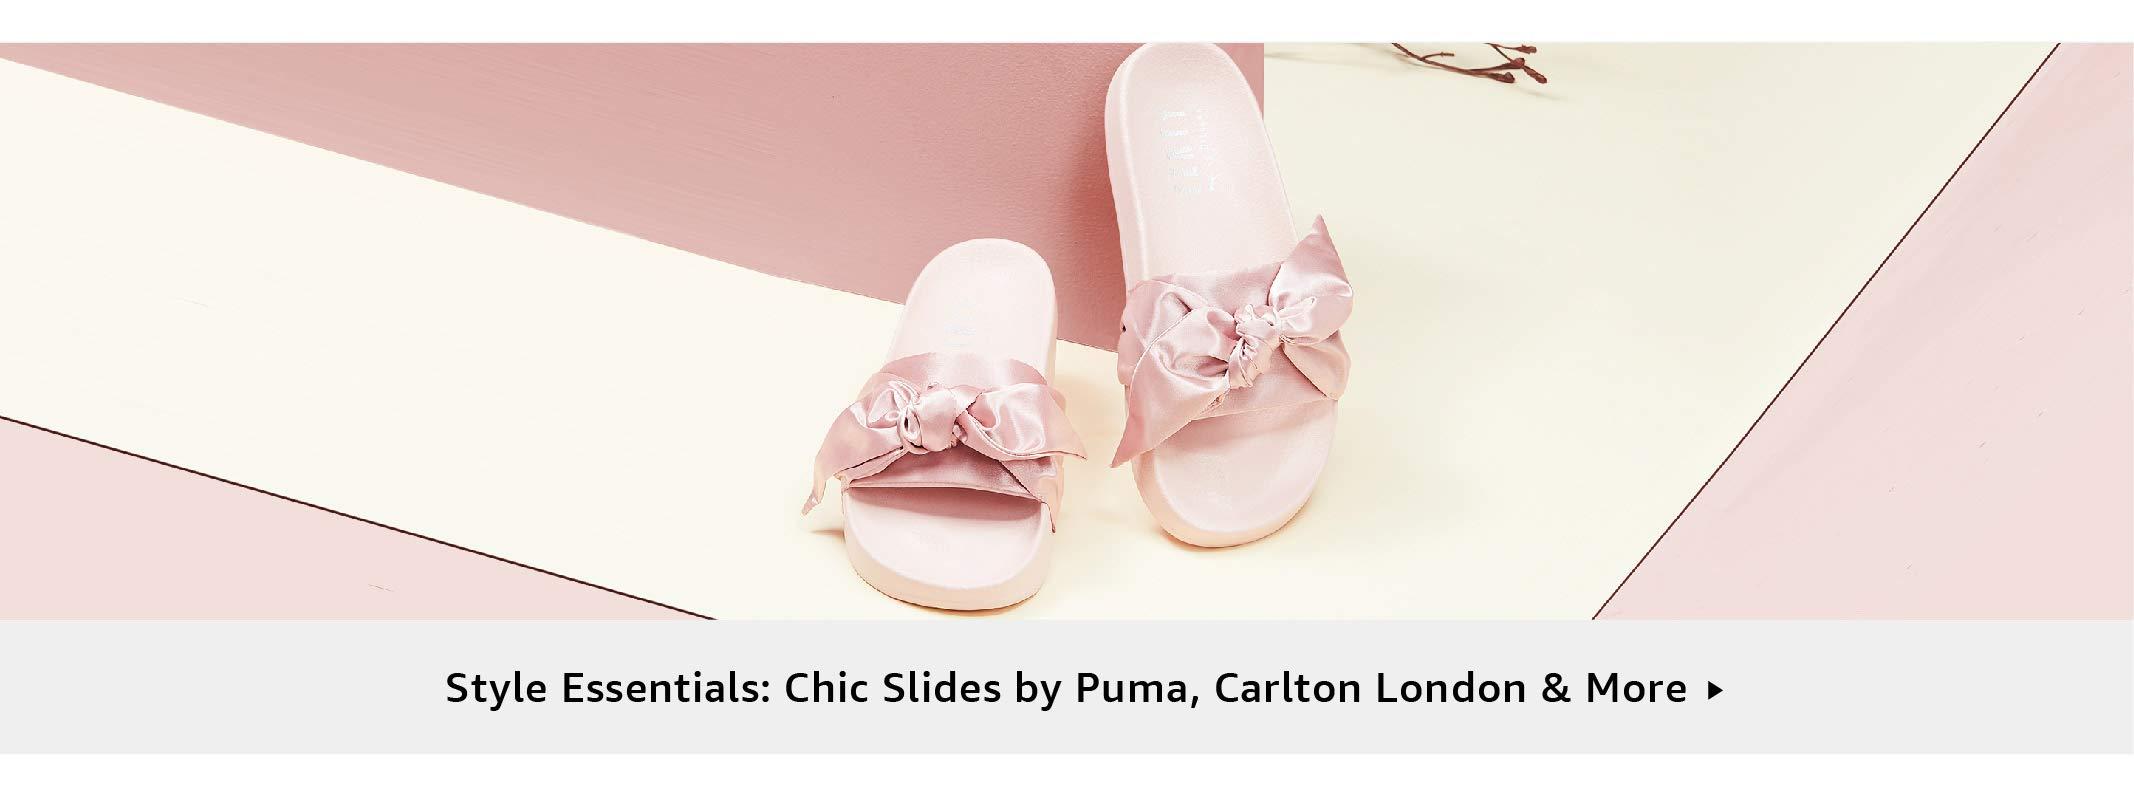 Style Essentials: Chic Slides by Puma,Carlton London & More